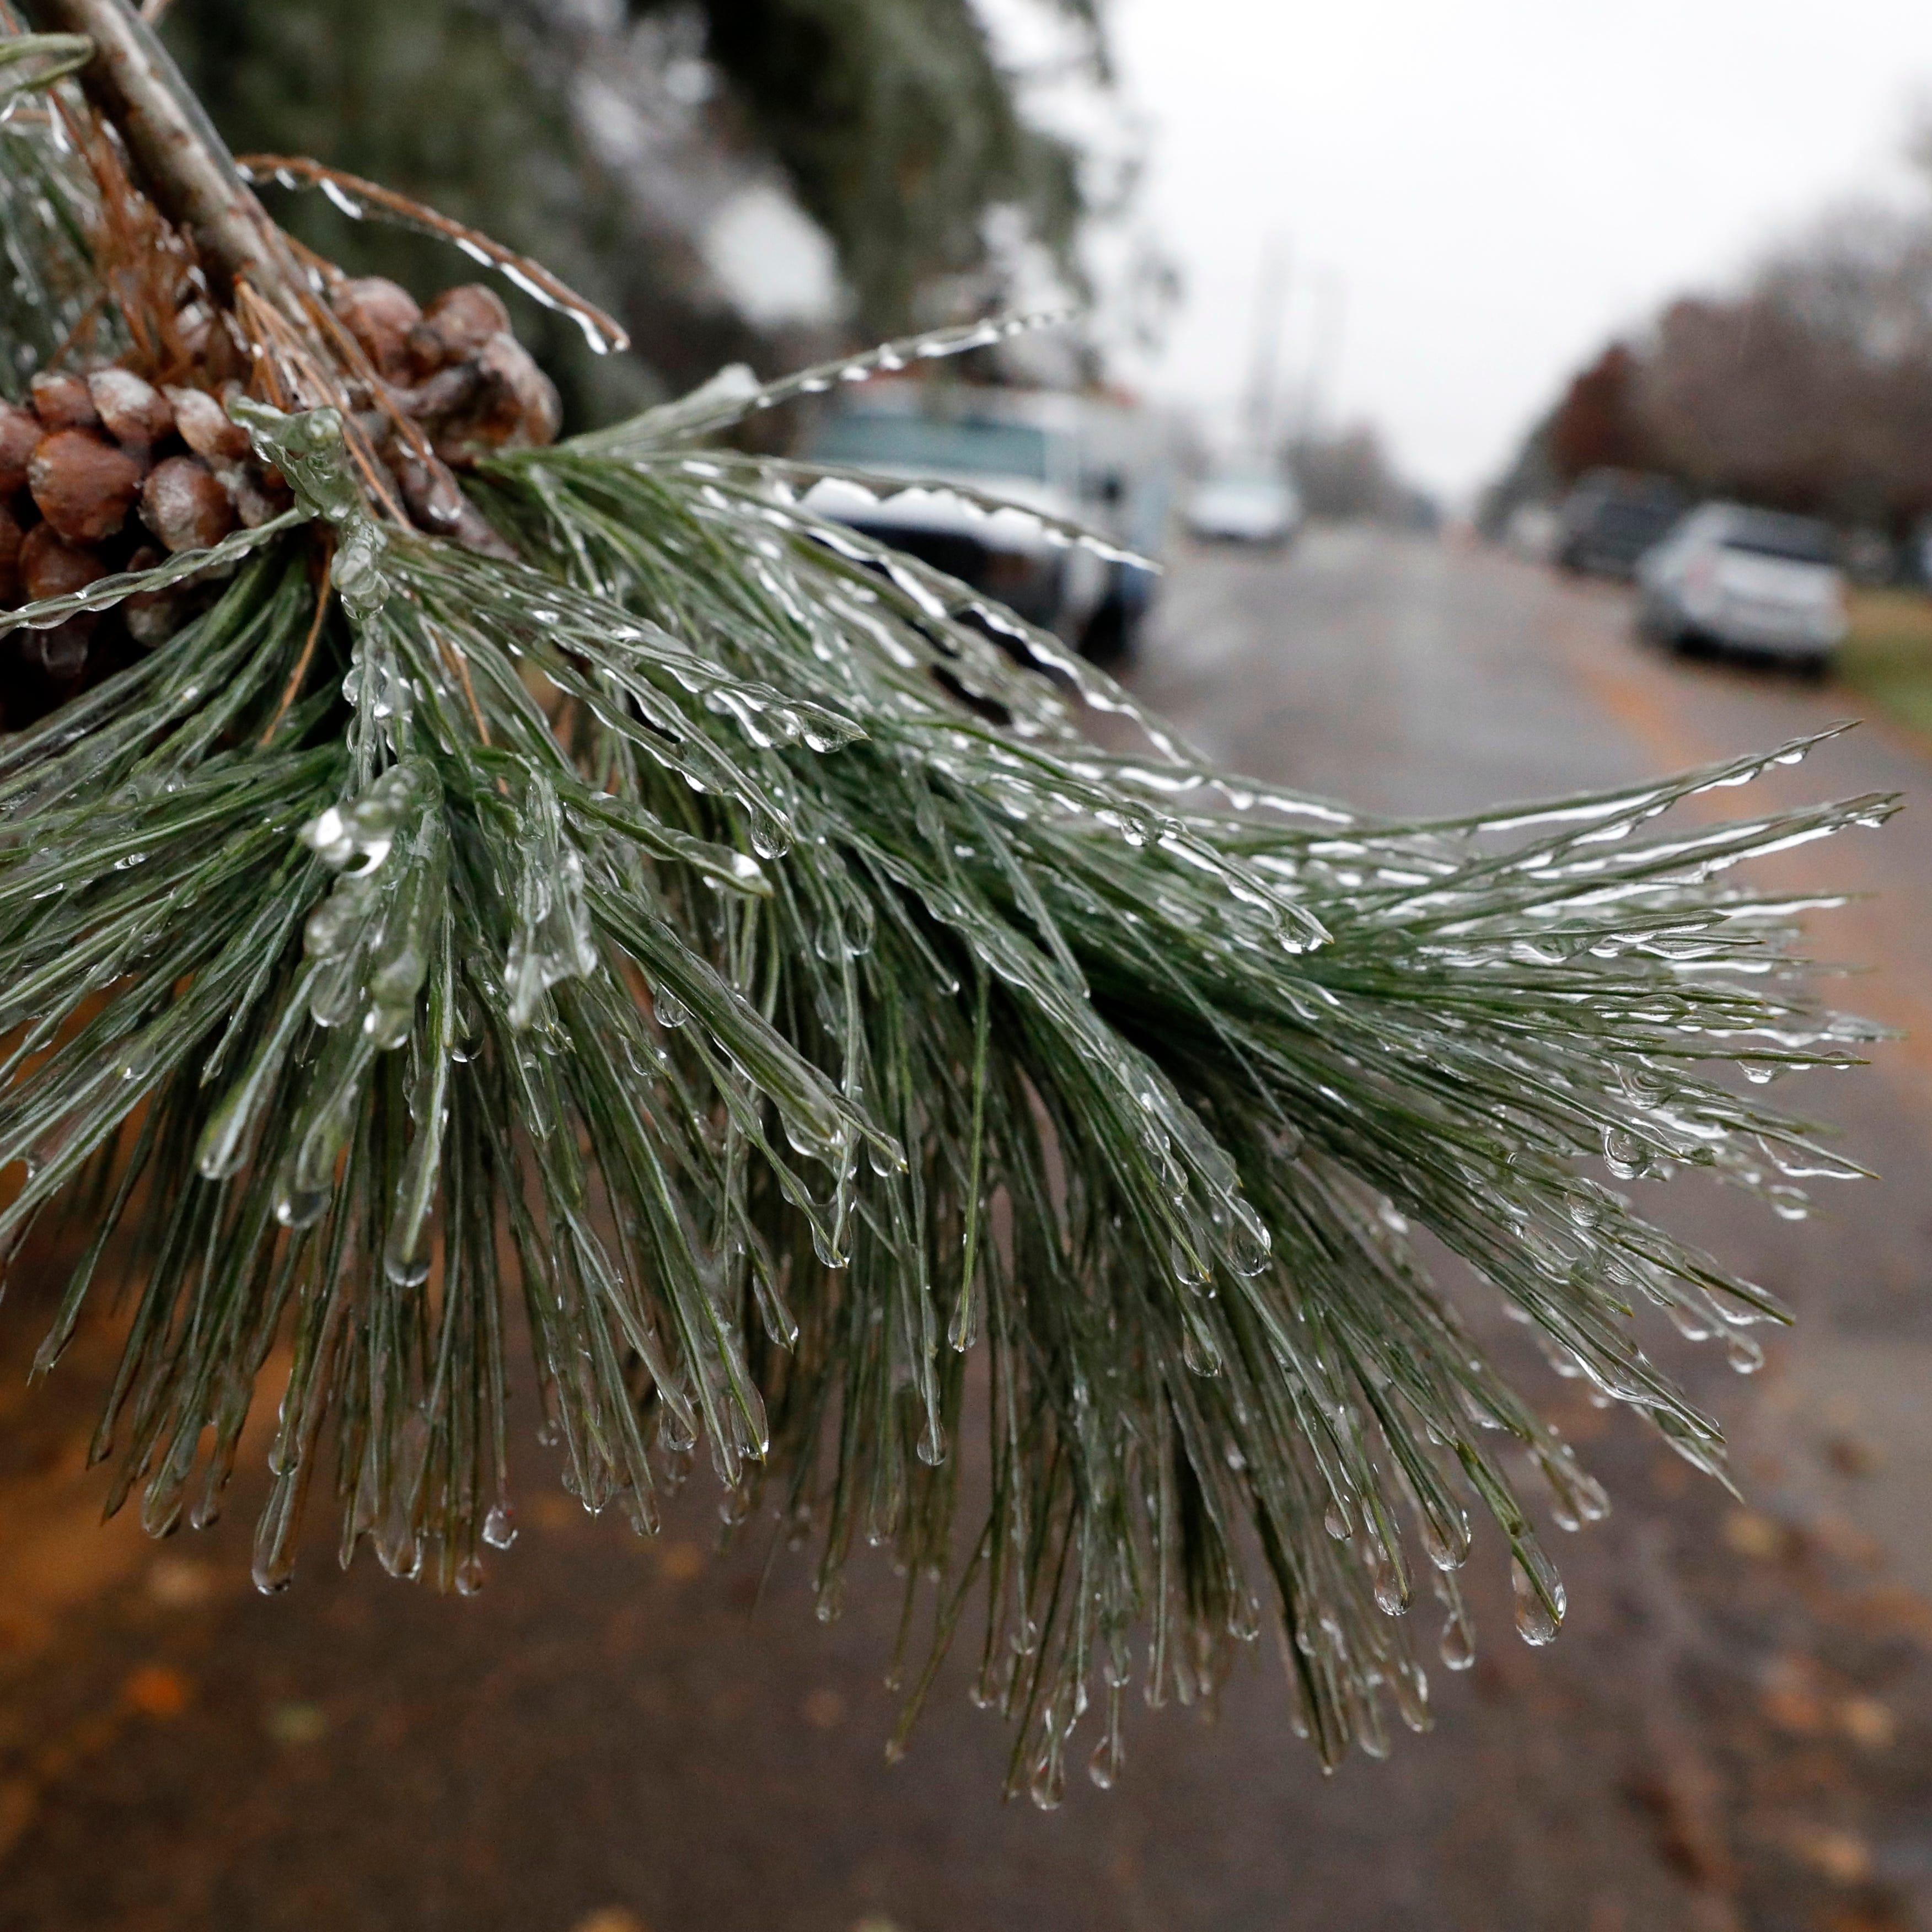 Icy conditions delay some Fairfield County schools